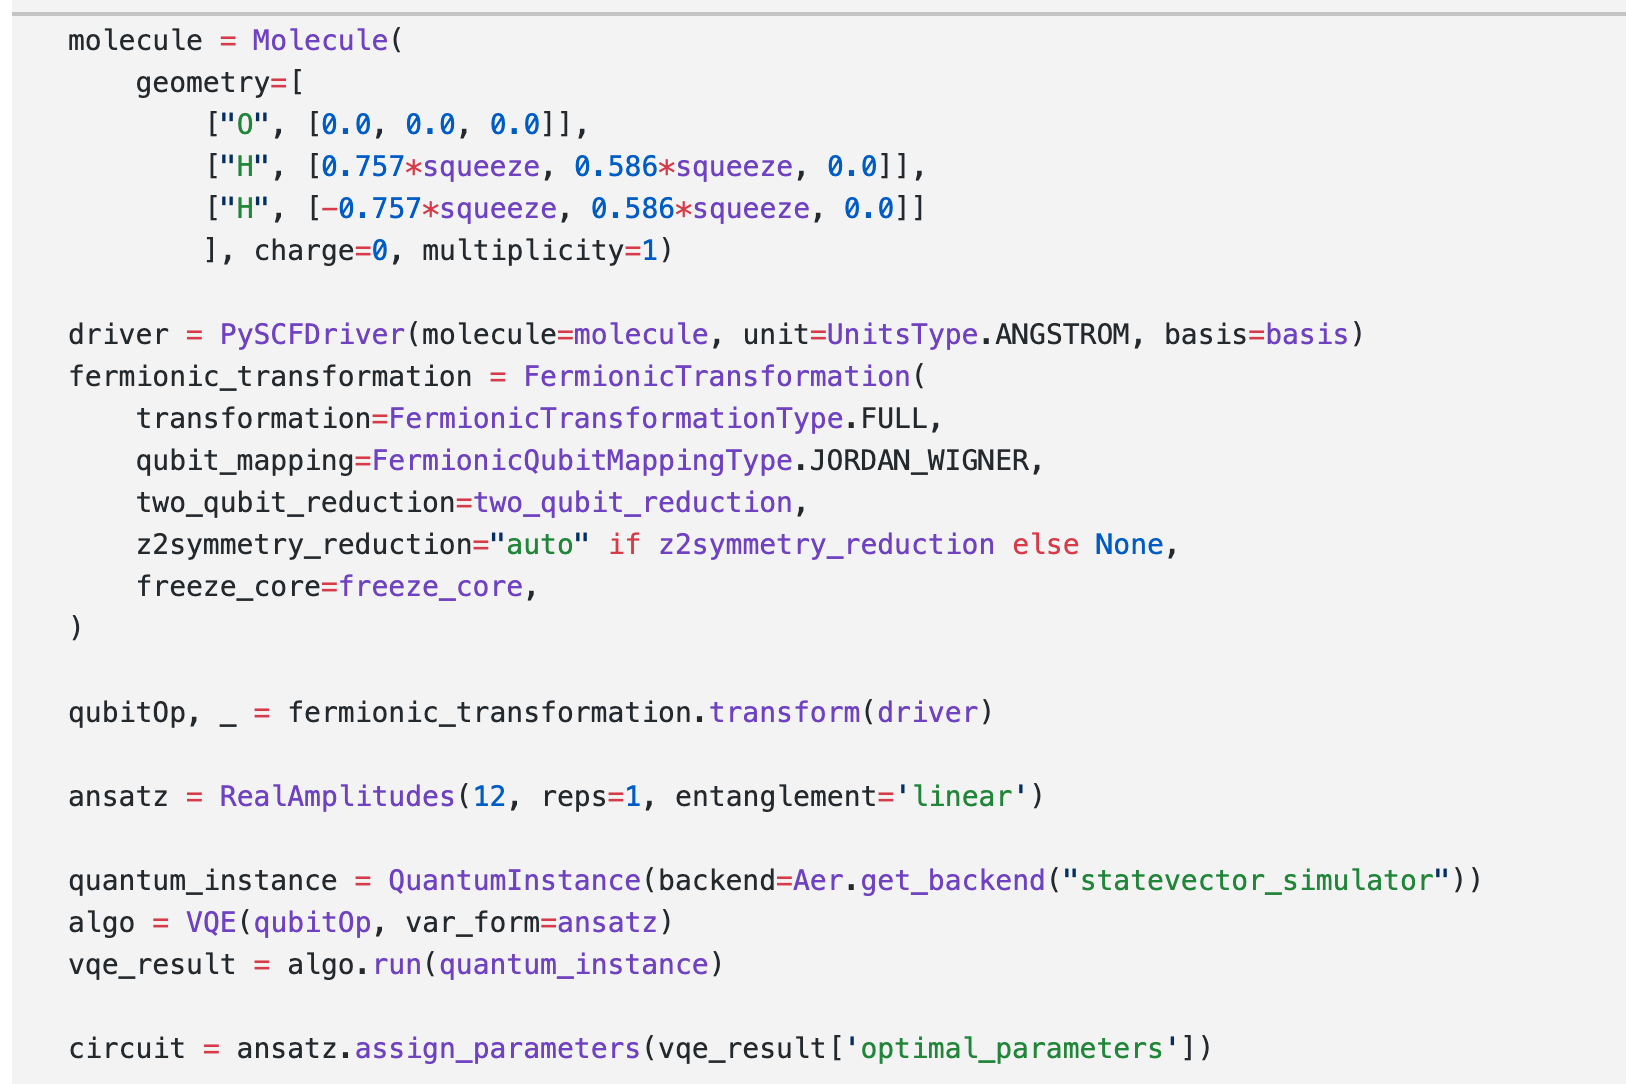 Code-Algorithmiq-design-quantum-technology-startup